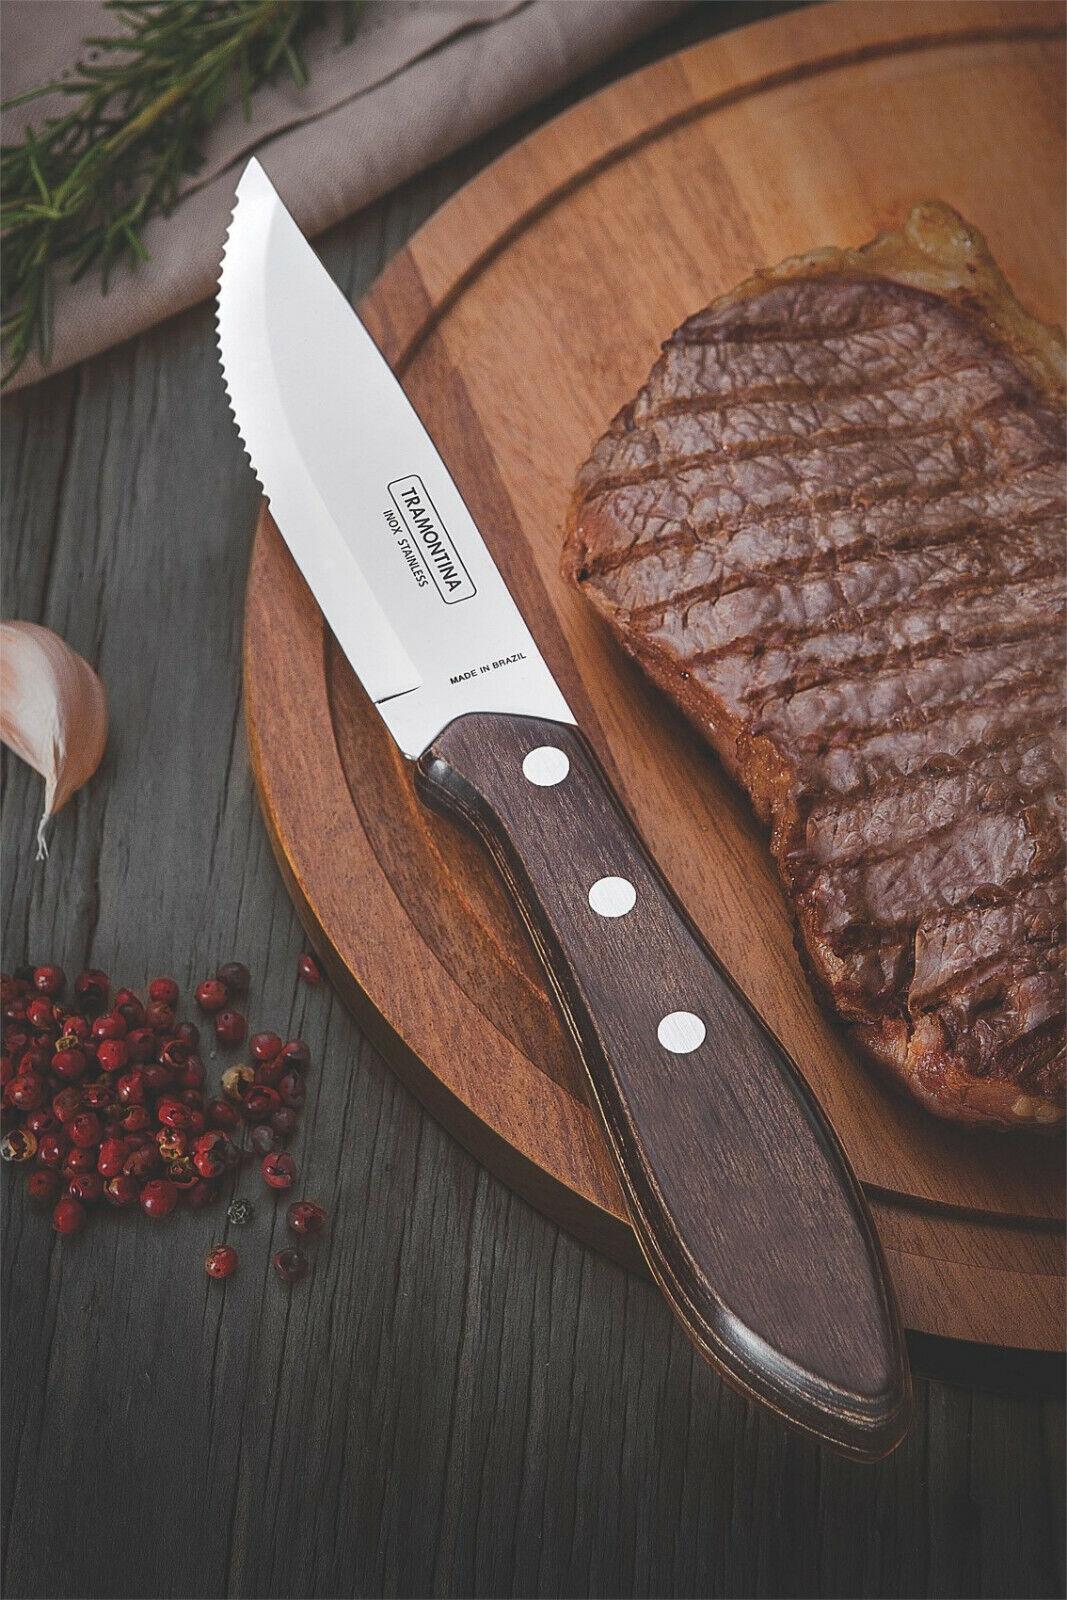 Tramontina Churrasco Tableware 8 Pcs.Steak Pcs.Steak Pcs.Steak Knife & Fork Cutlery Set JUMBO FSC d4a2b2